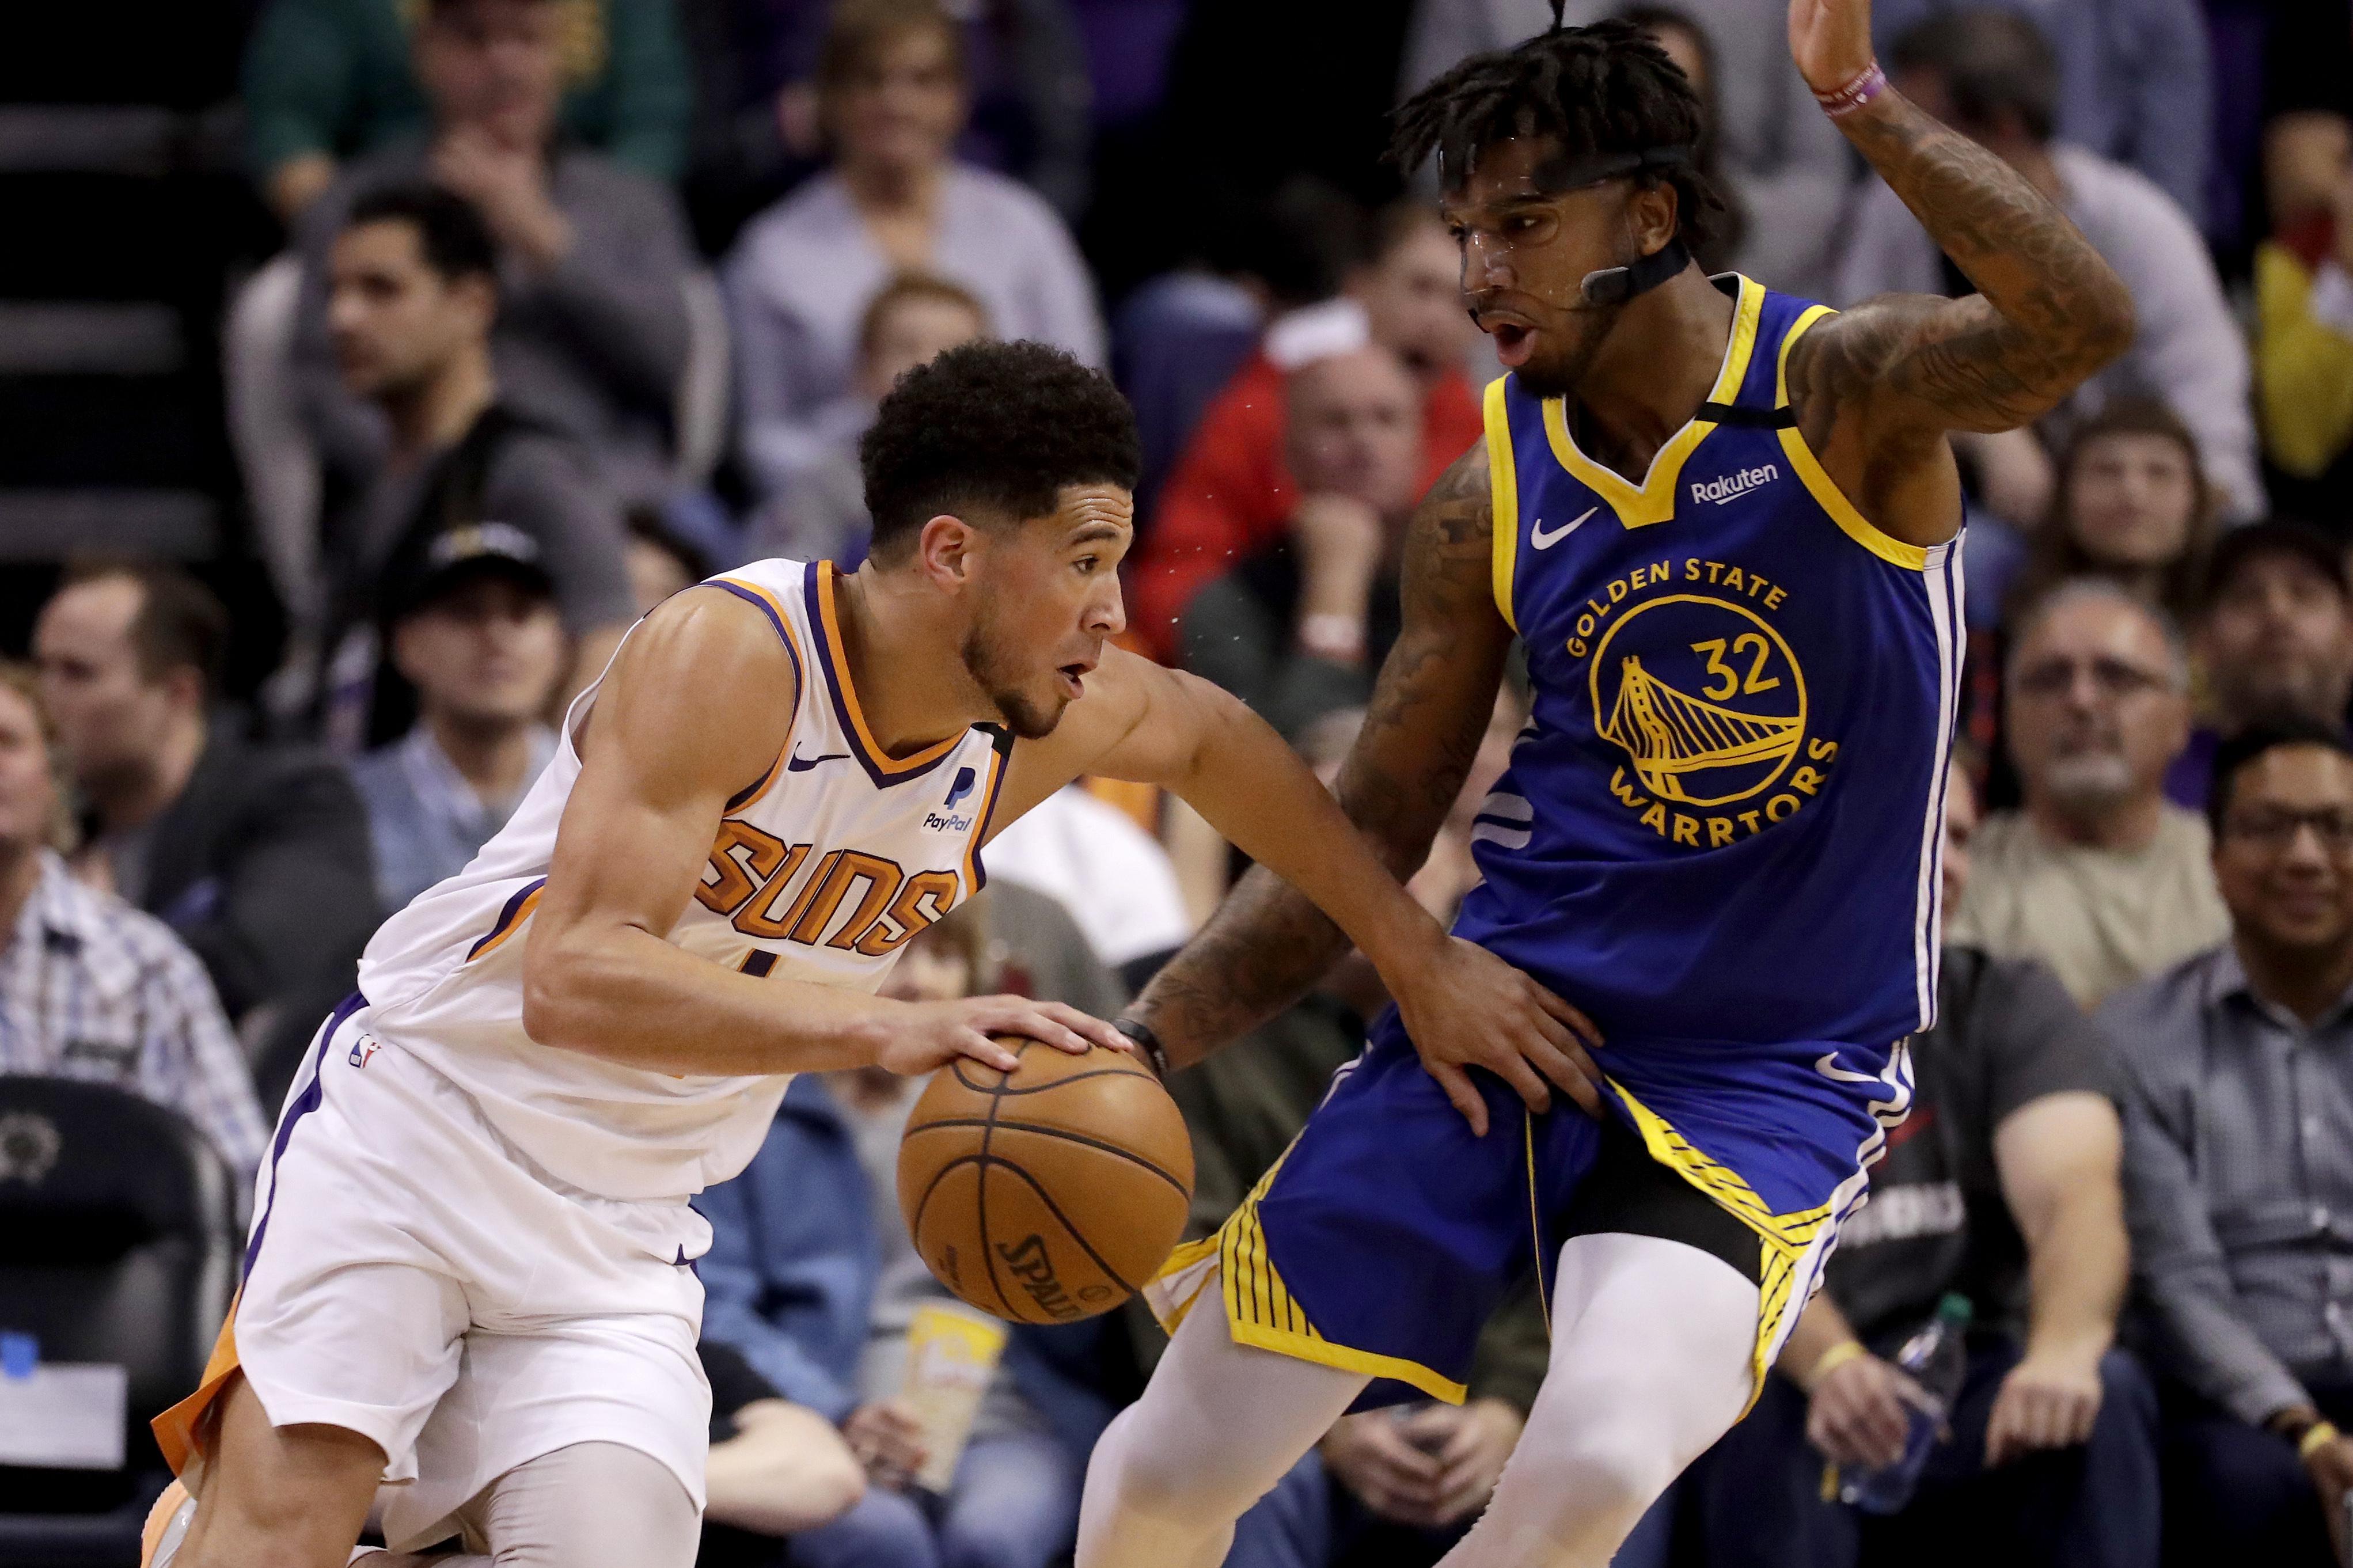 Devin Booker scores 27 points, Suns top Warriors 112-106